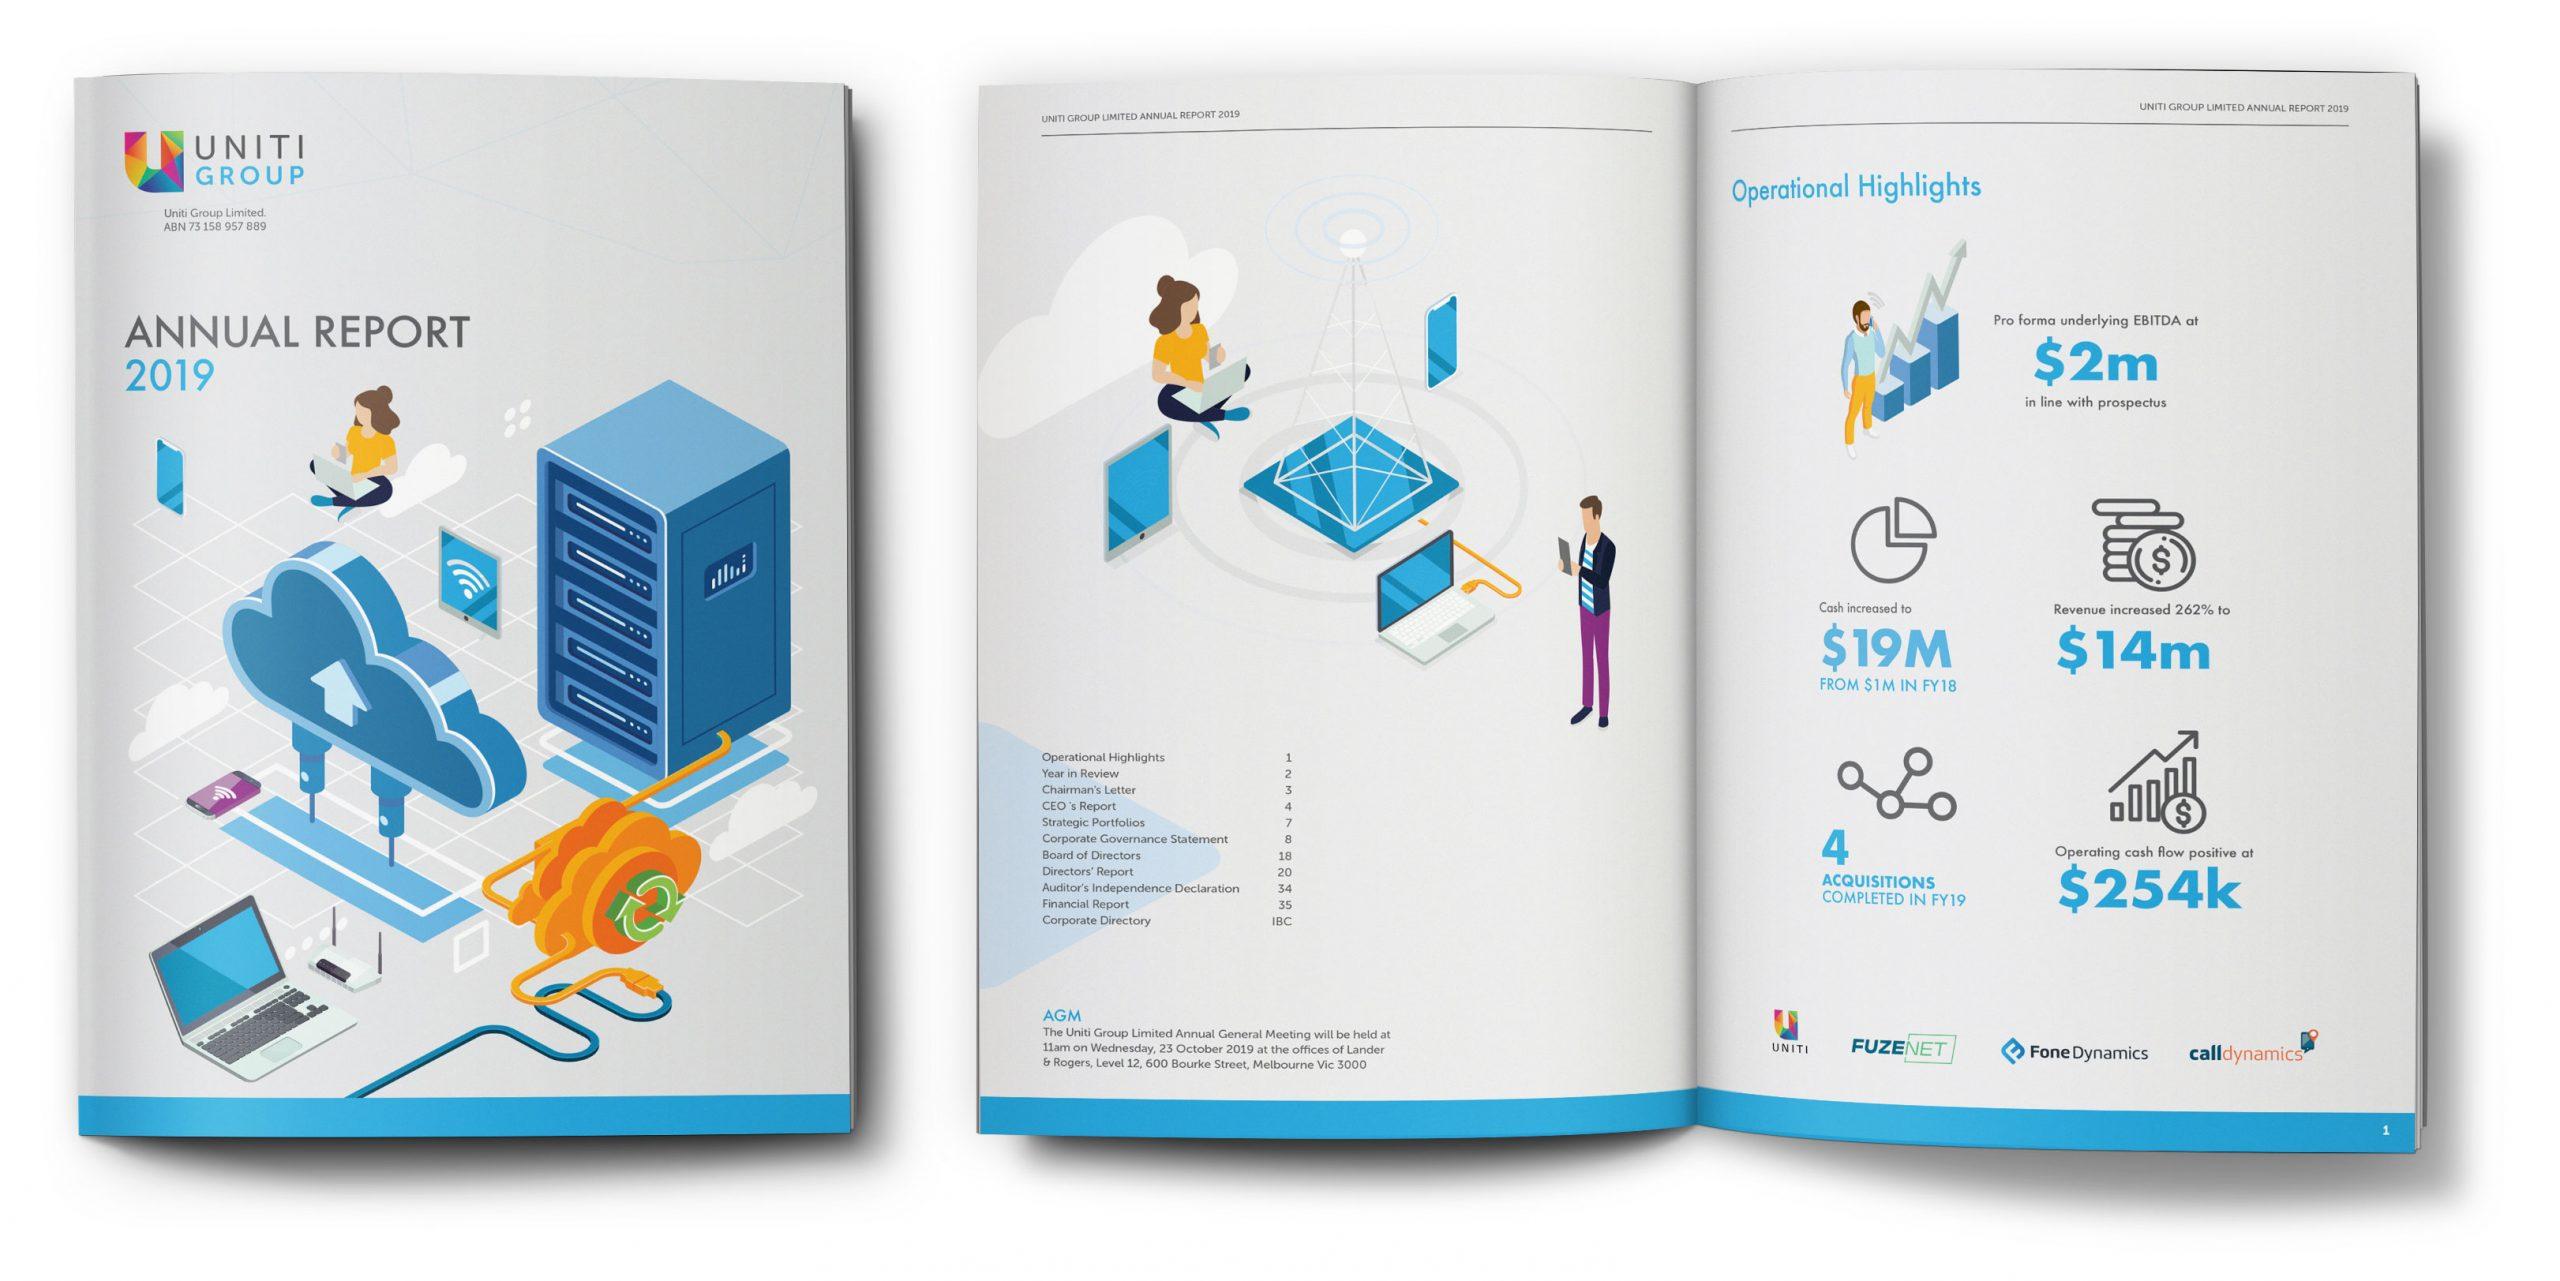 Uniti Group Annual Report 2019